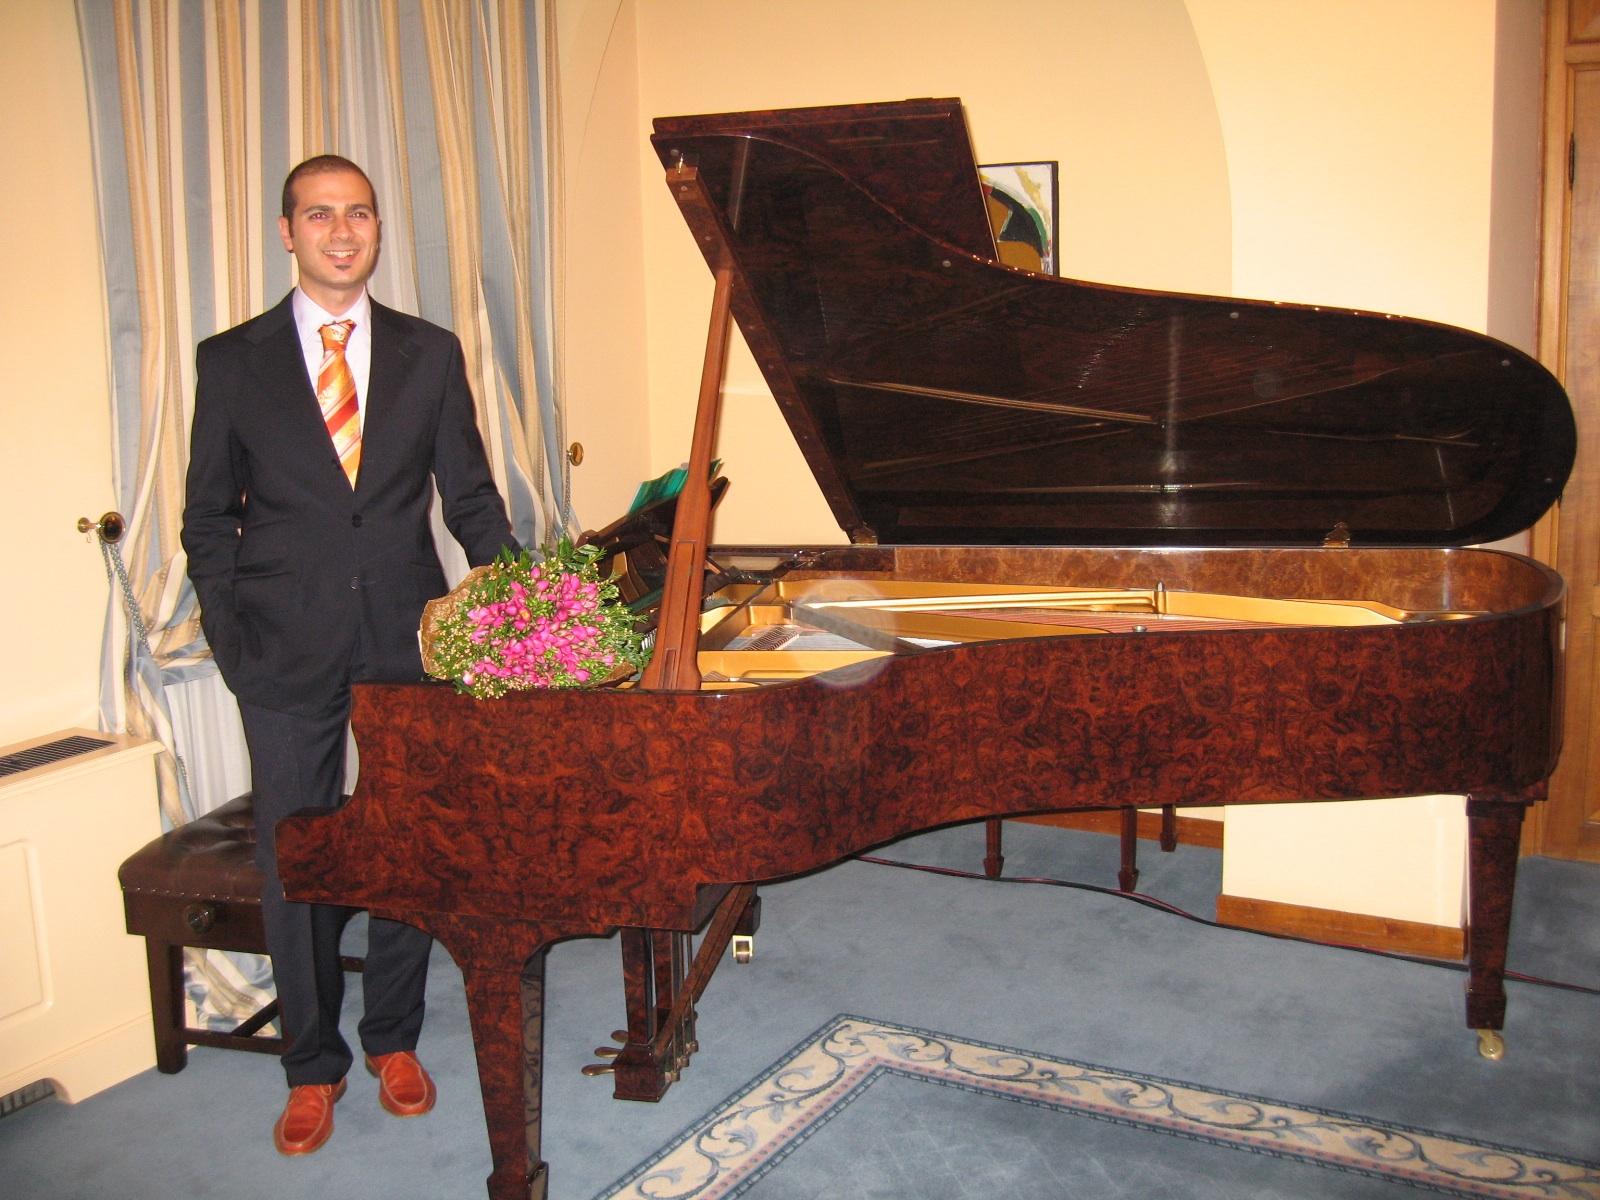 Presidential Pianist